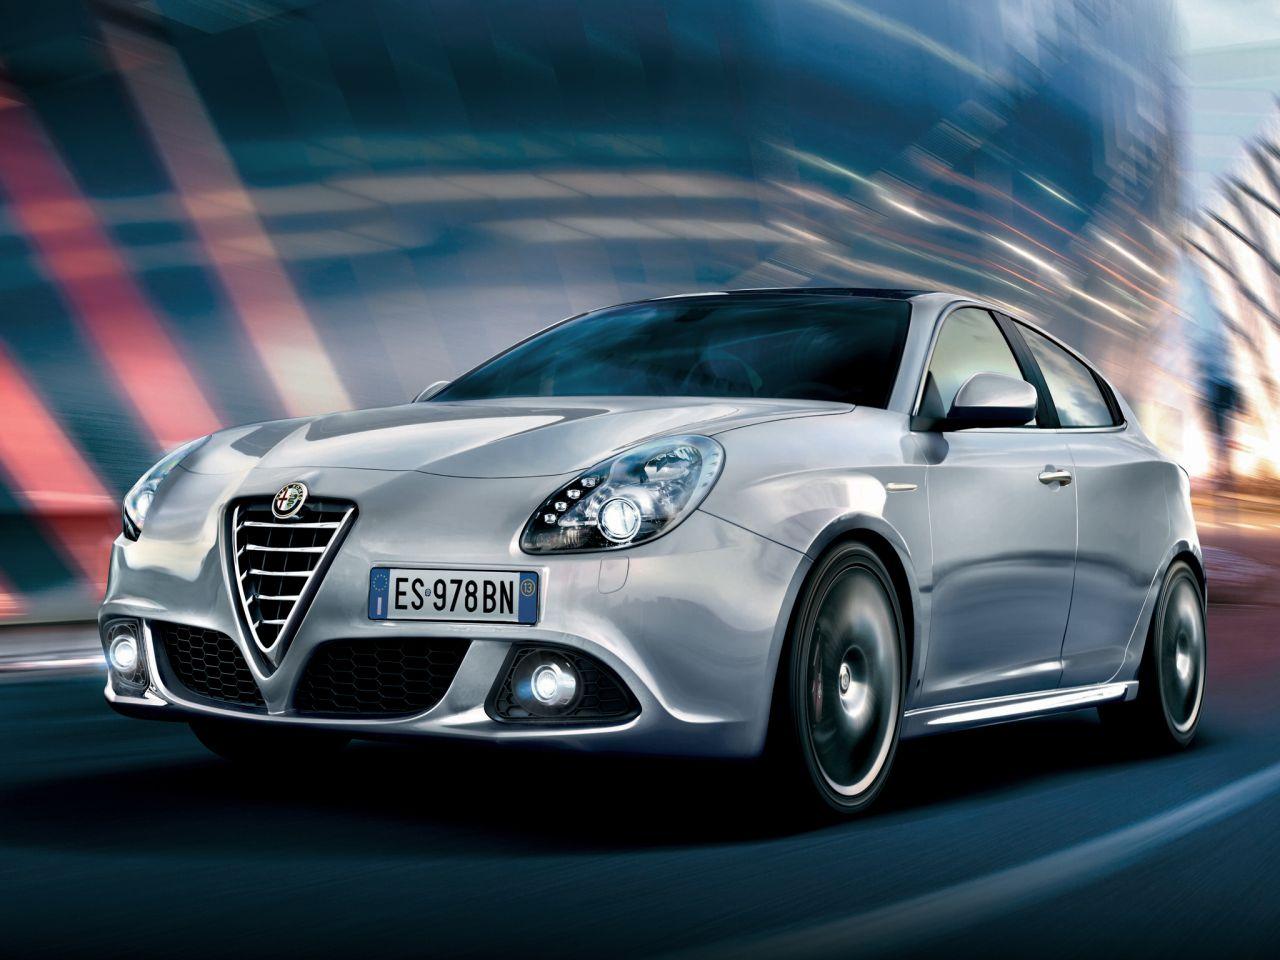 Alfa-Romeo-Giulietta-MY2014-01.jpg